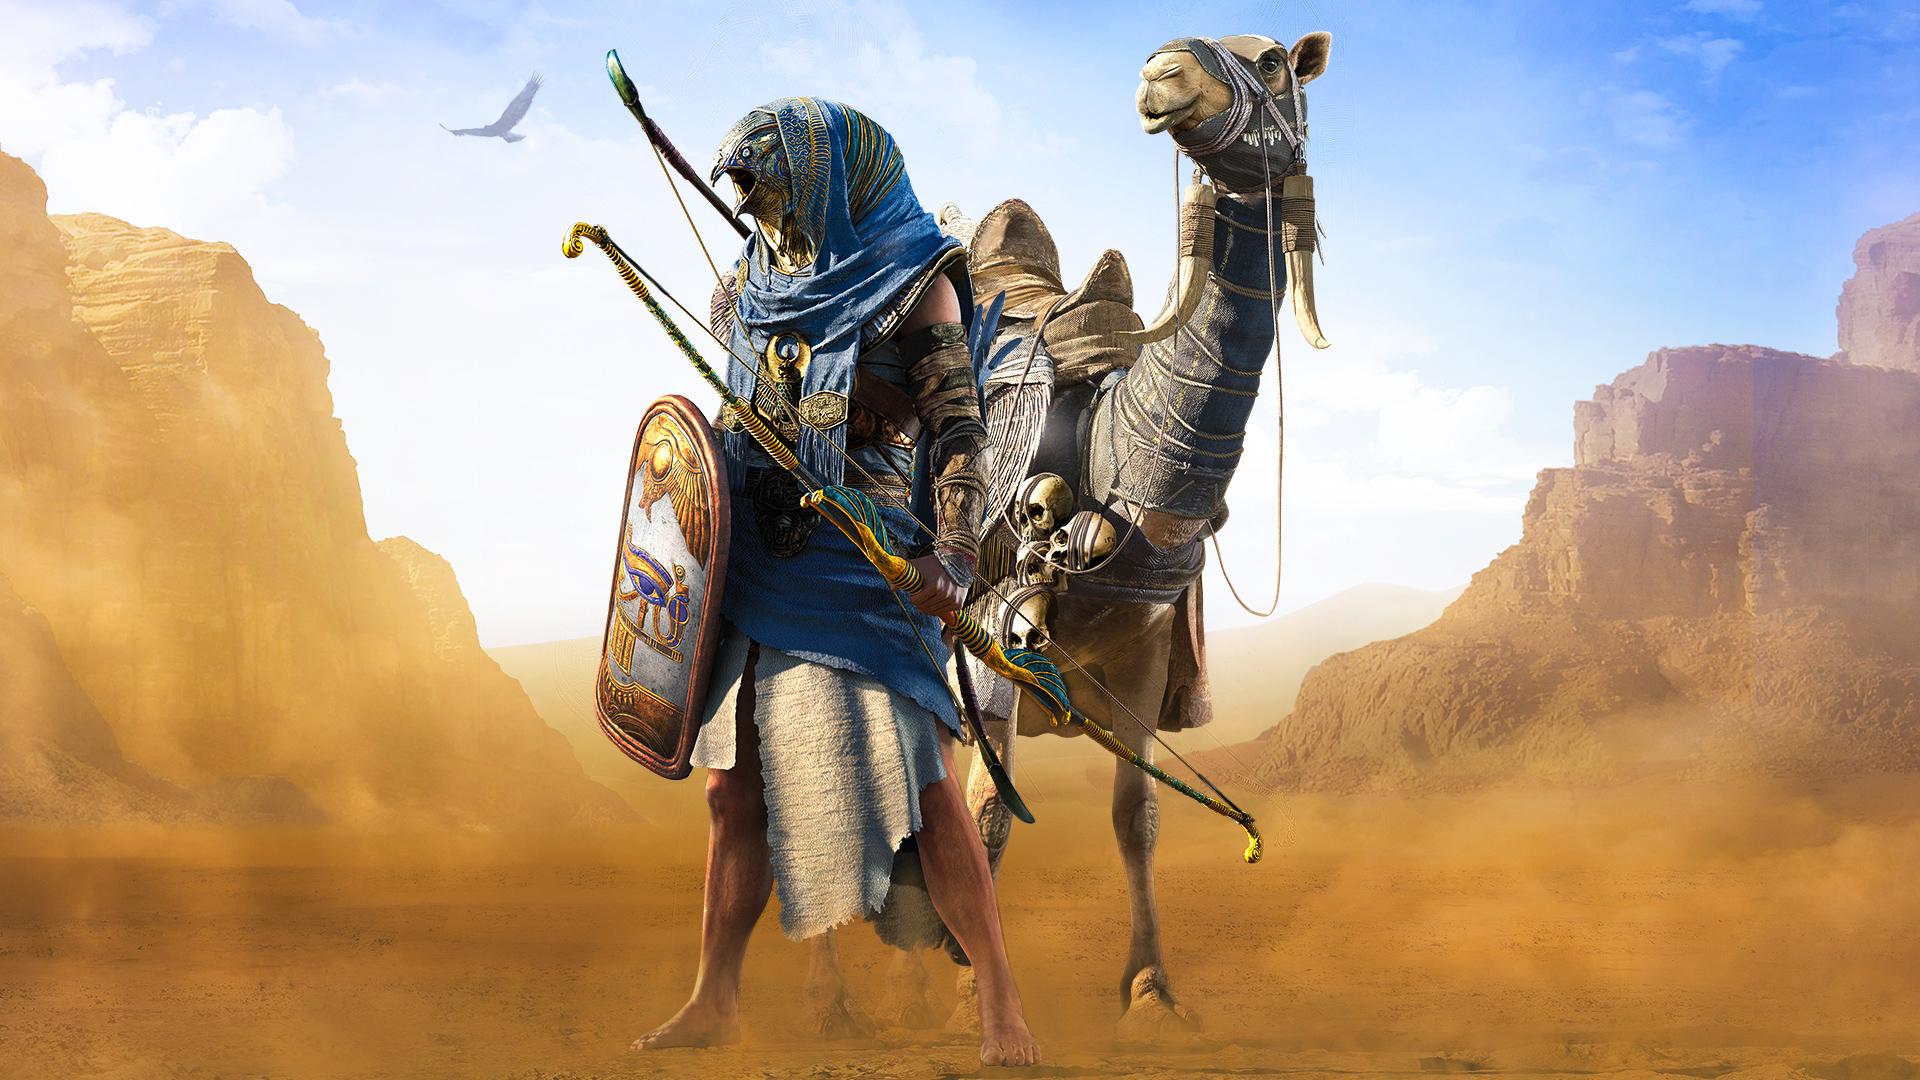 Horus Assassins Creed Origins Wallpapers Hd Wallpapers